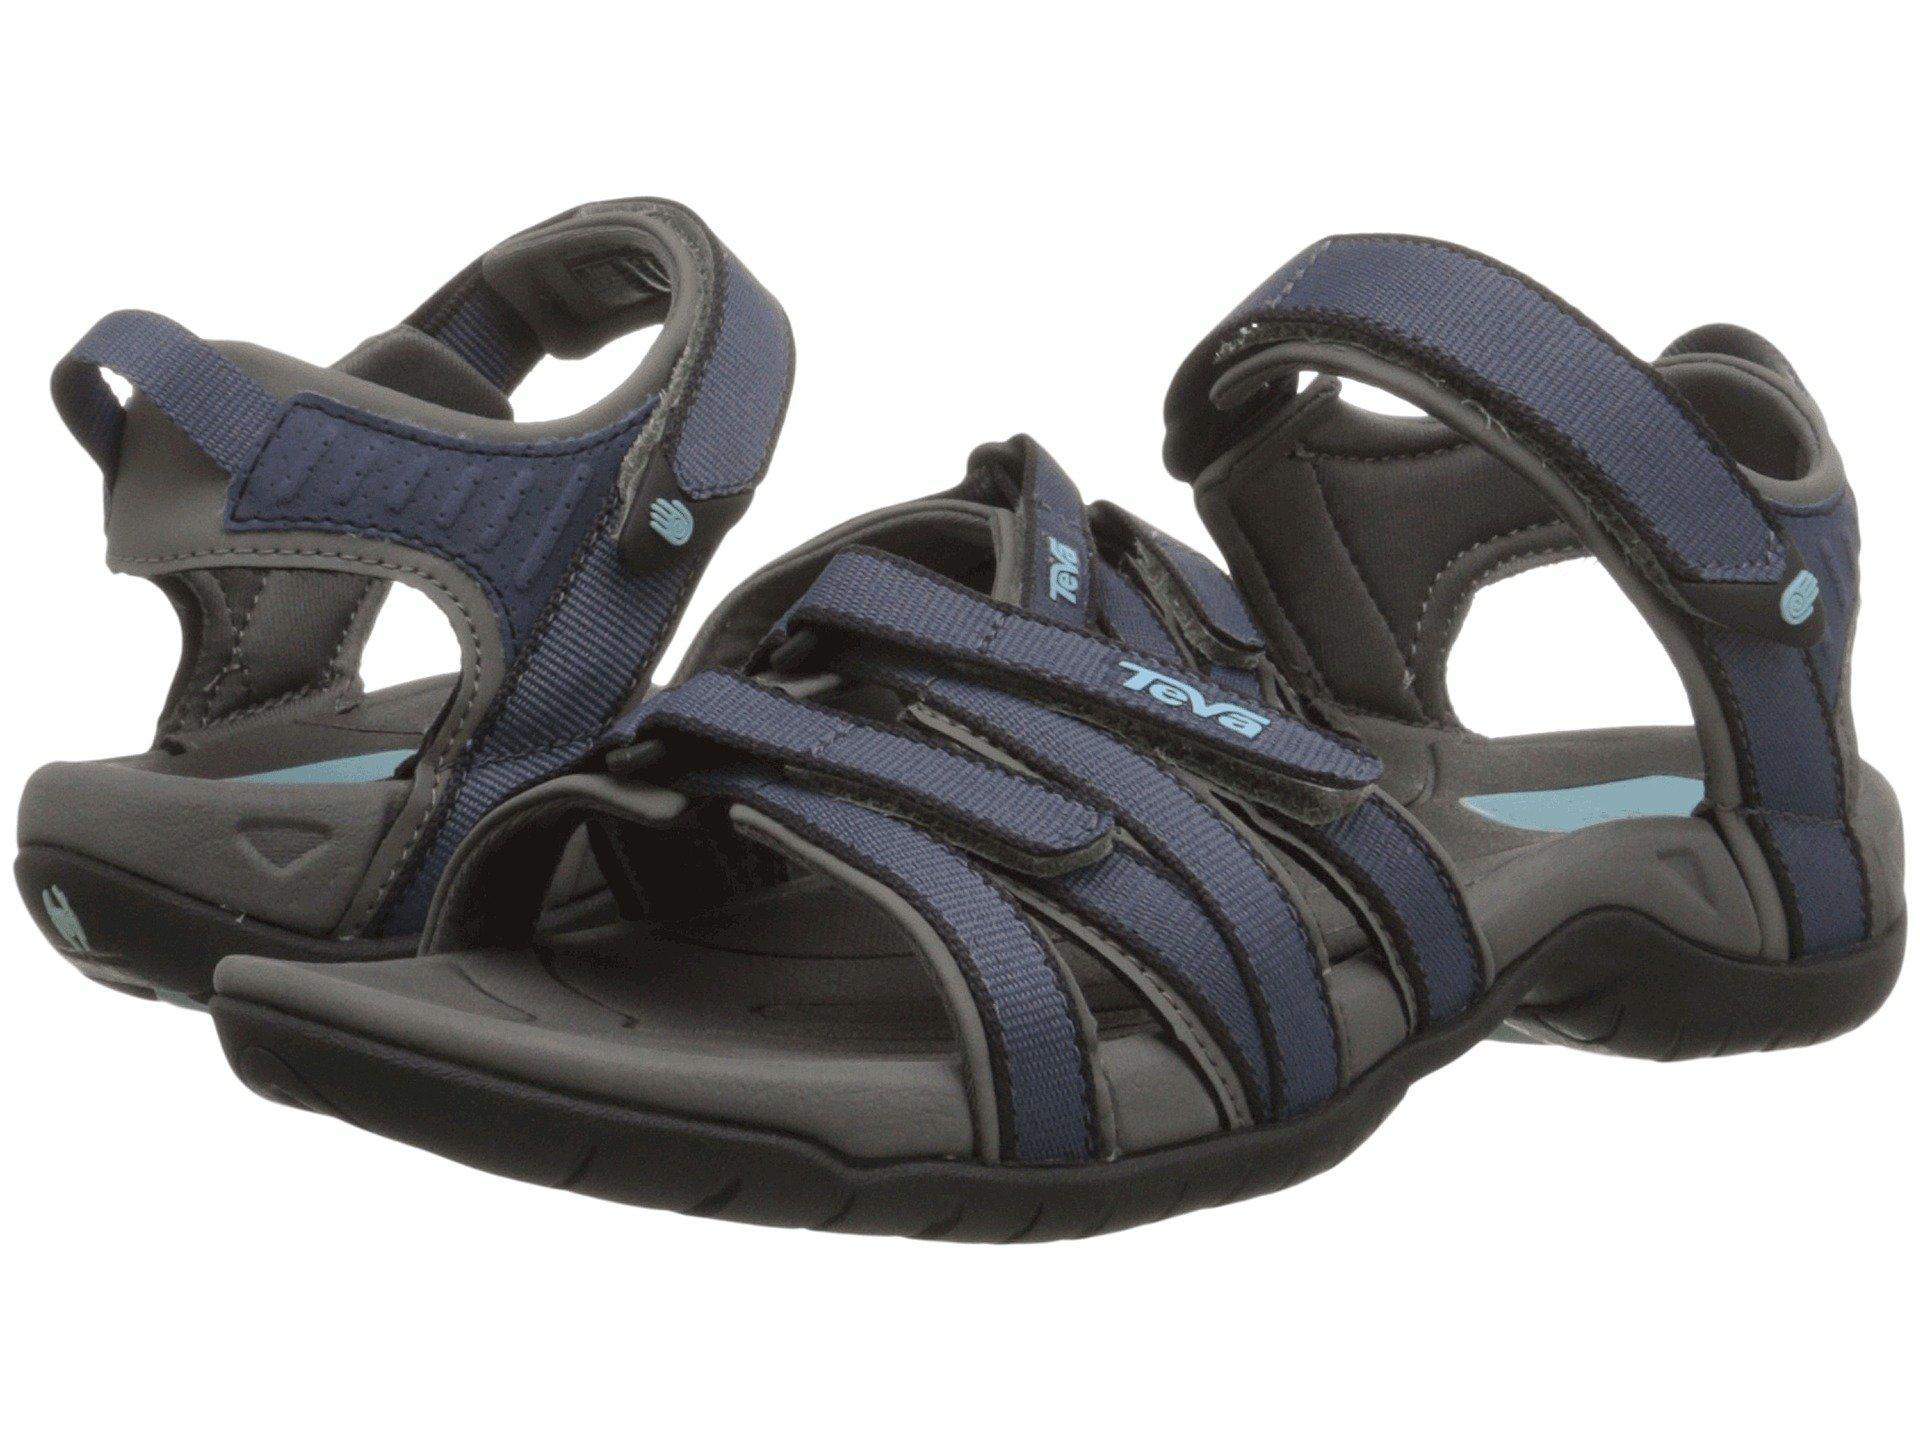 cab70d08458 Lyst - Teva Tirra (hera Gray Mist) Women's Sandals in Blue